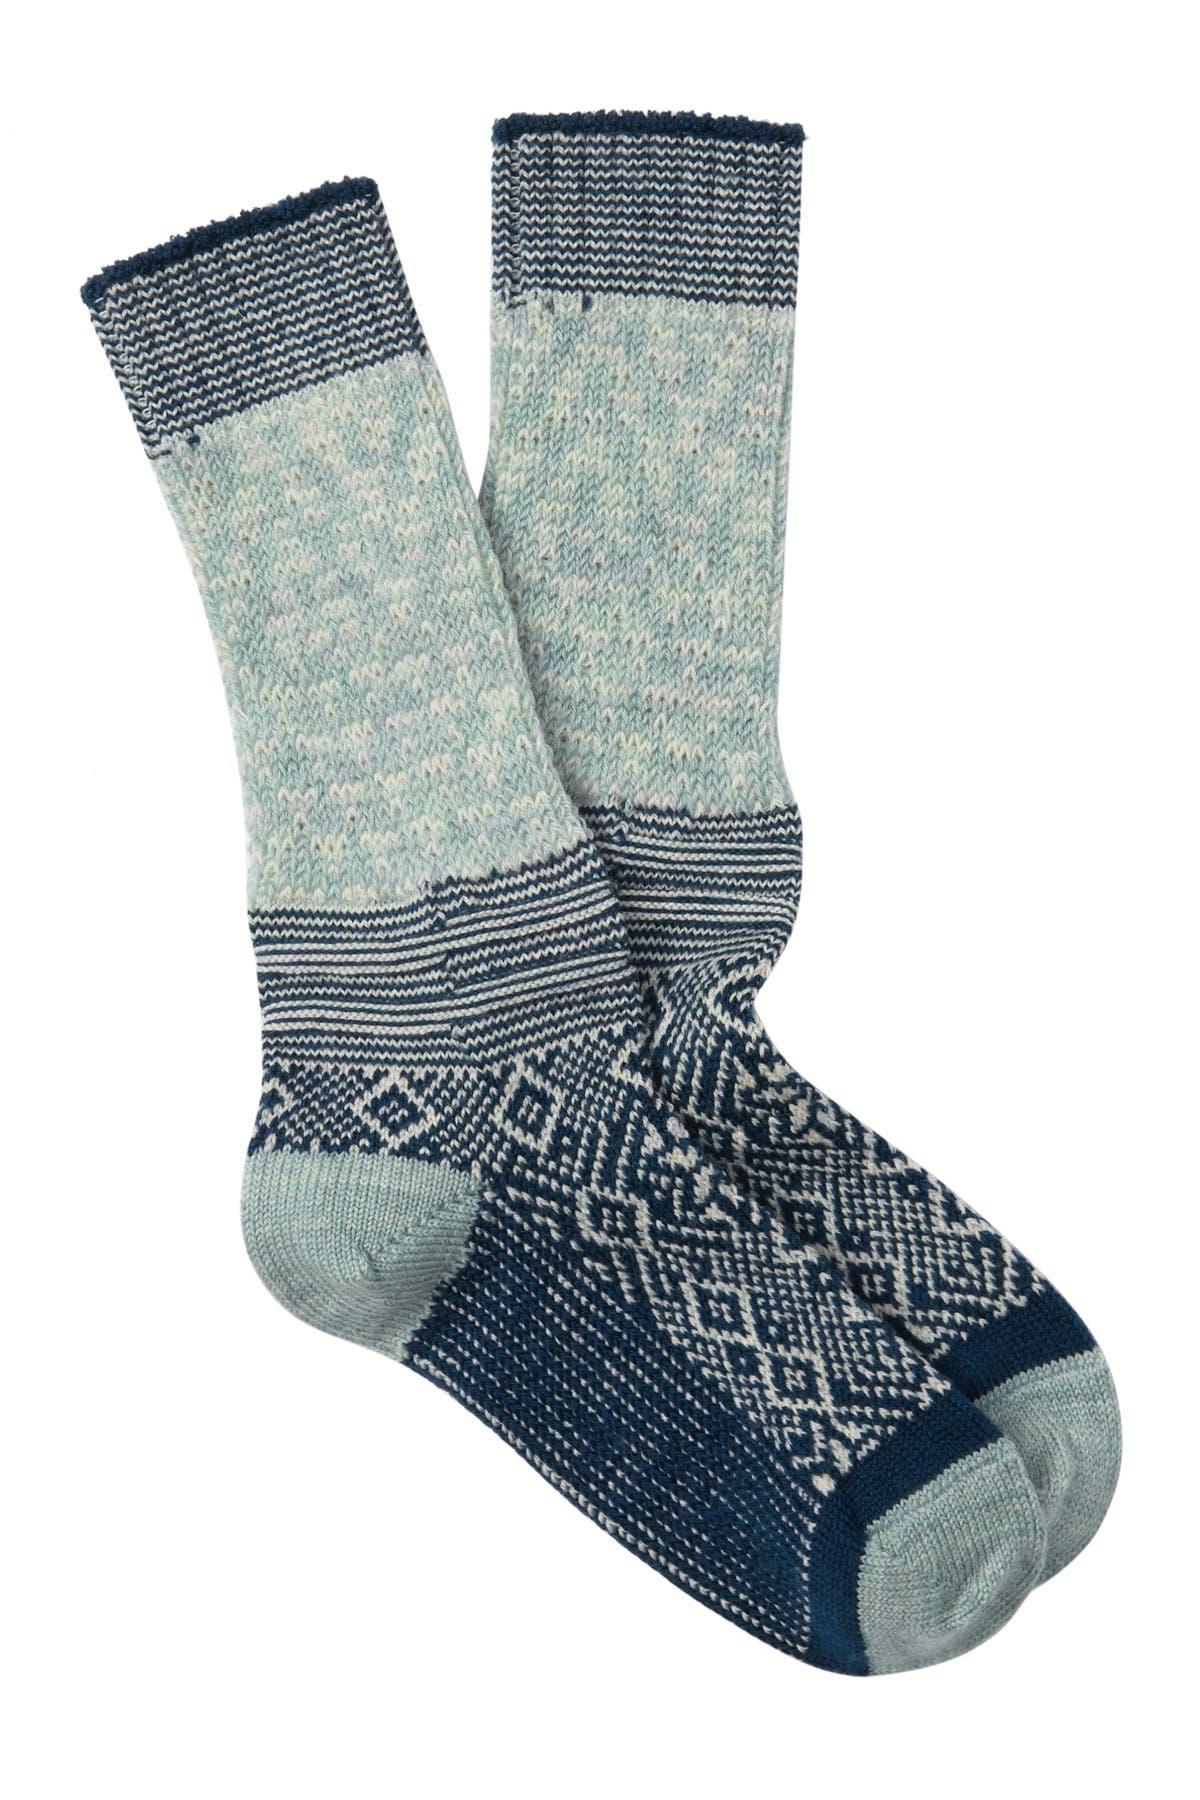 Image of SmartWool Snowflake Flurry Crew Socks